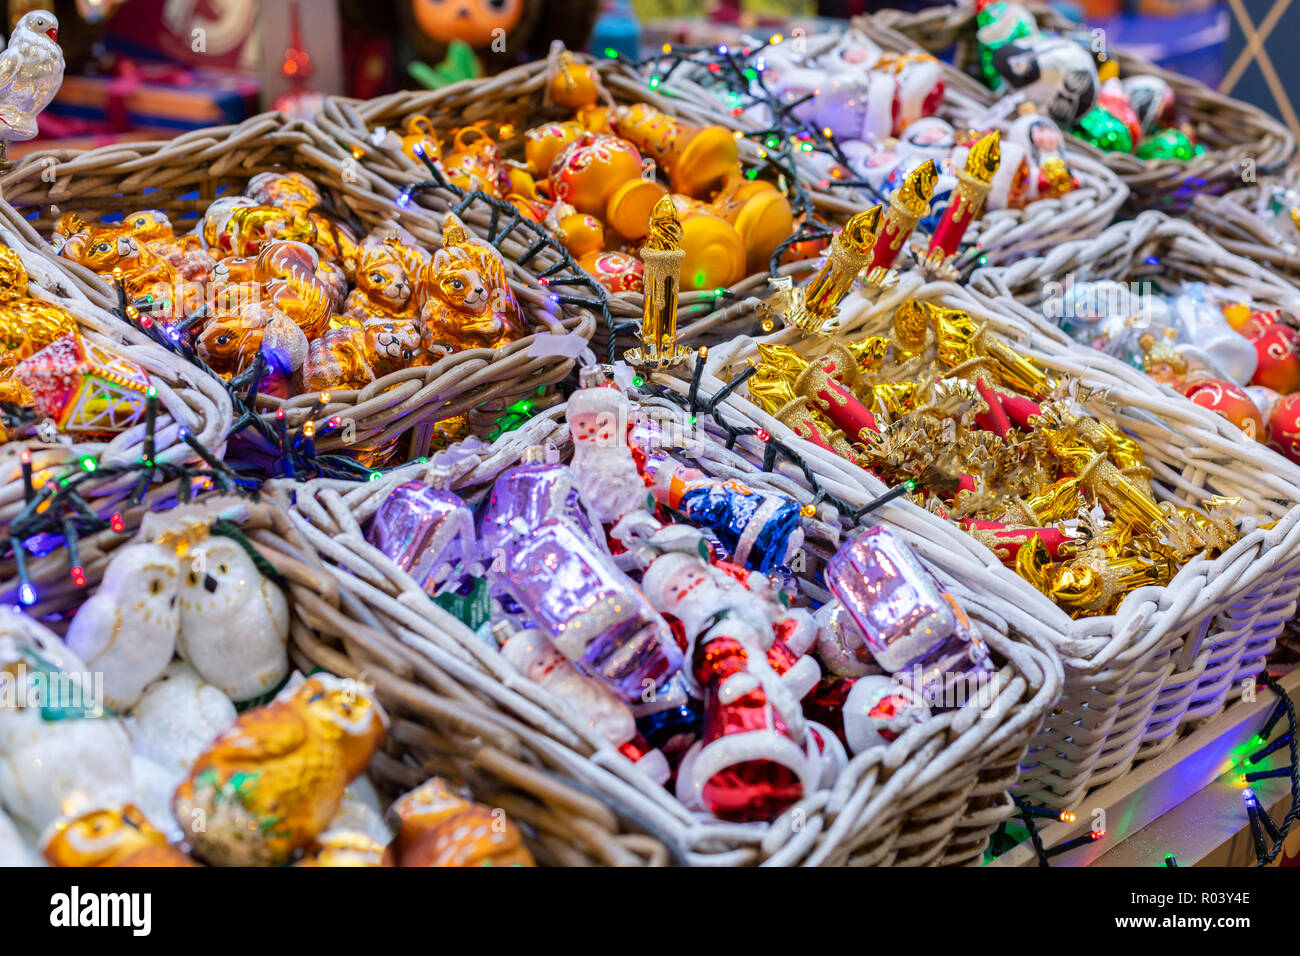 Various decorations and souvenirs on christmas market. Xmas fair. Festive Holiday. Christmas market, fair. Close up. - Stock Image